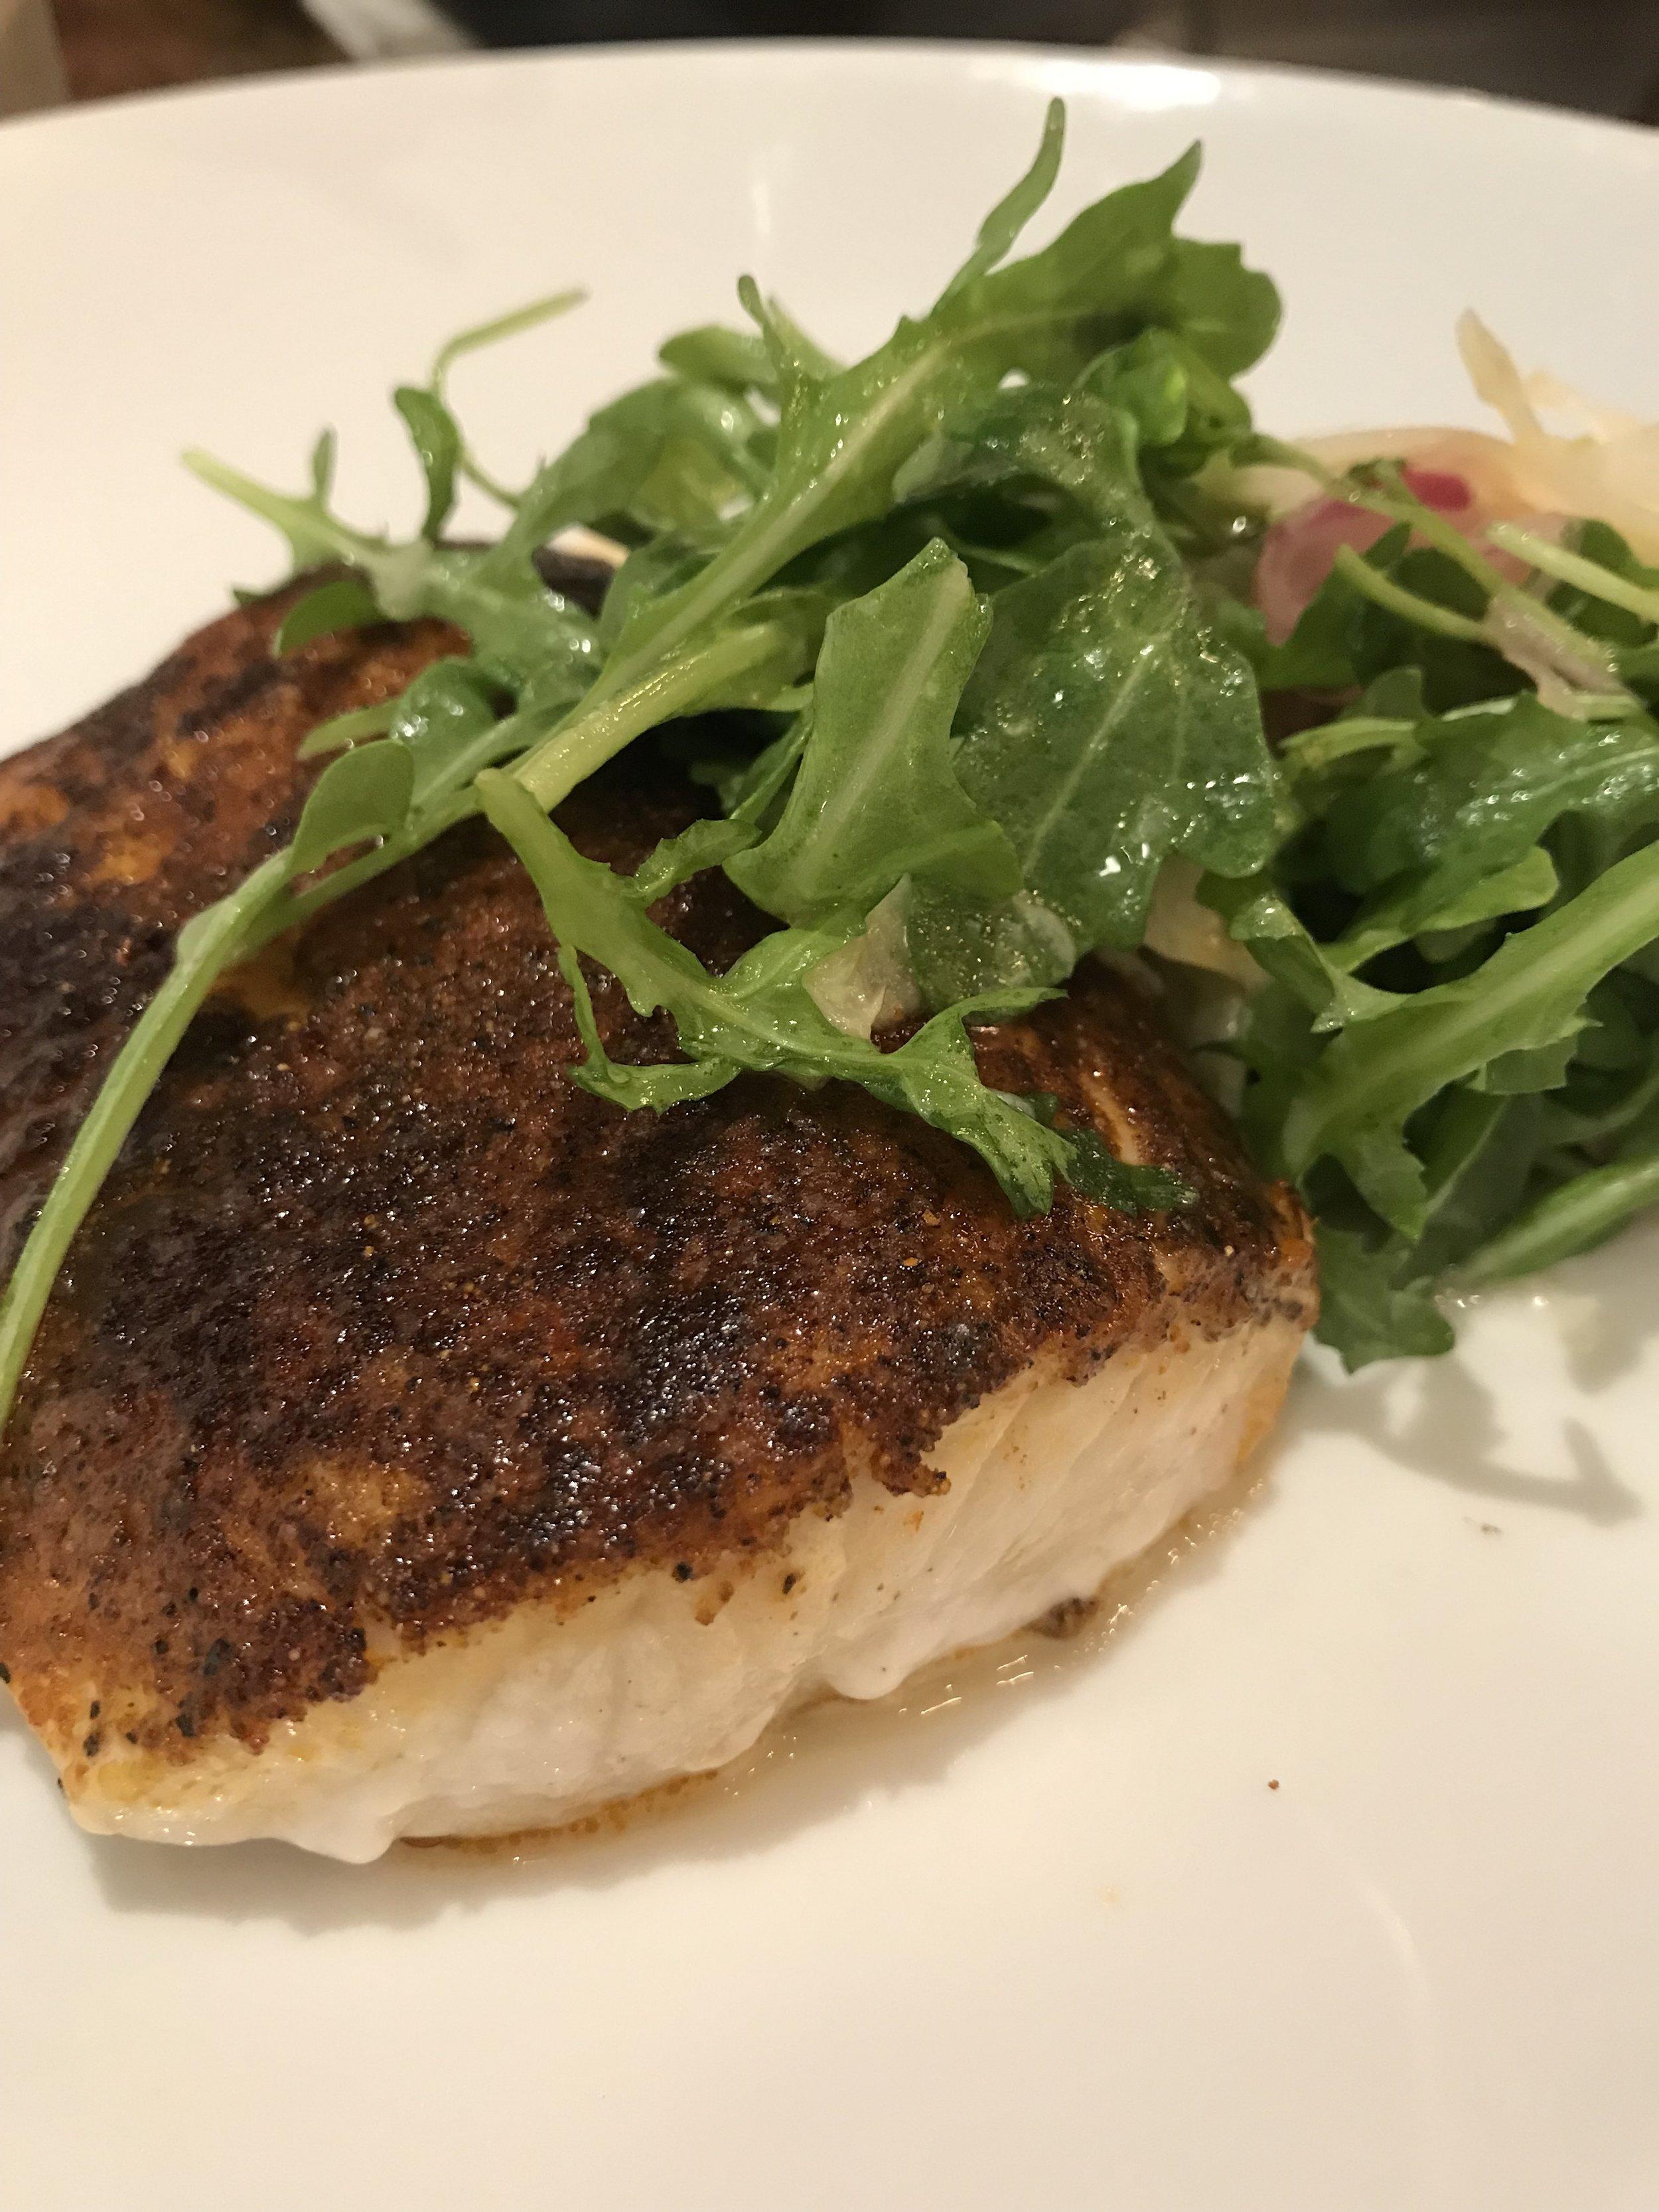 Cracked by Chef Adrianne Calvo Fresh Fish